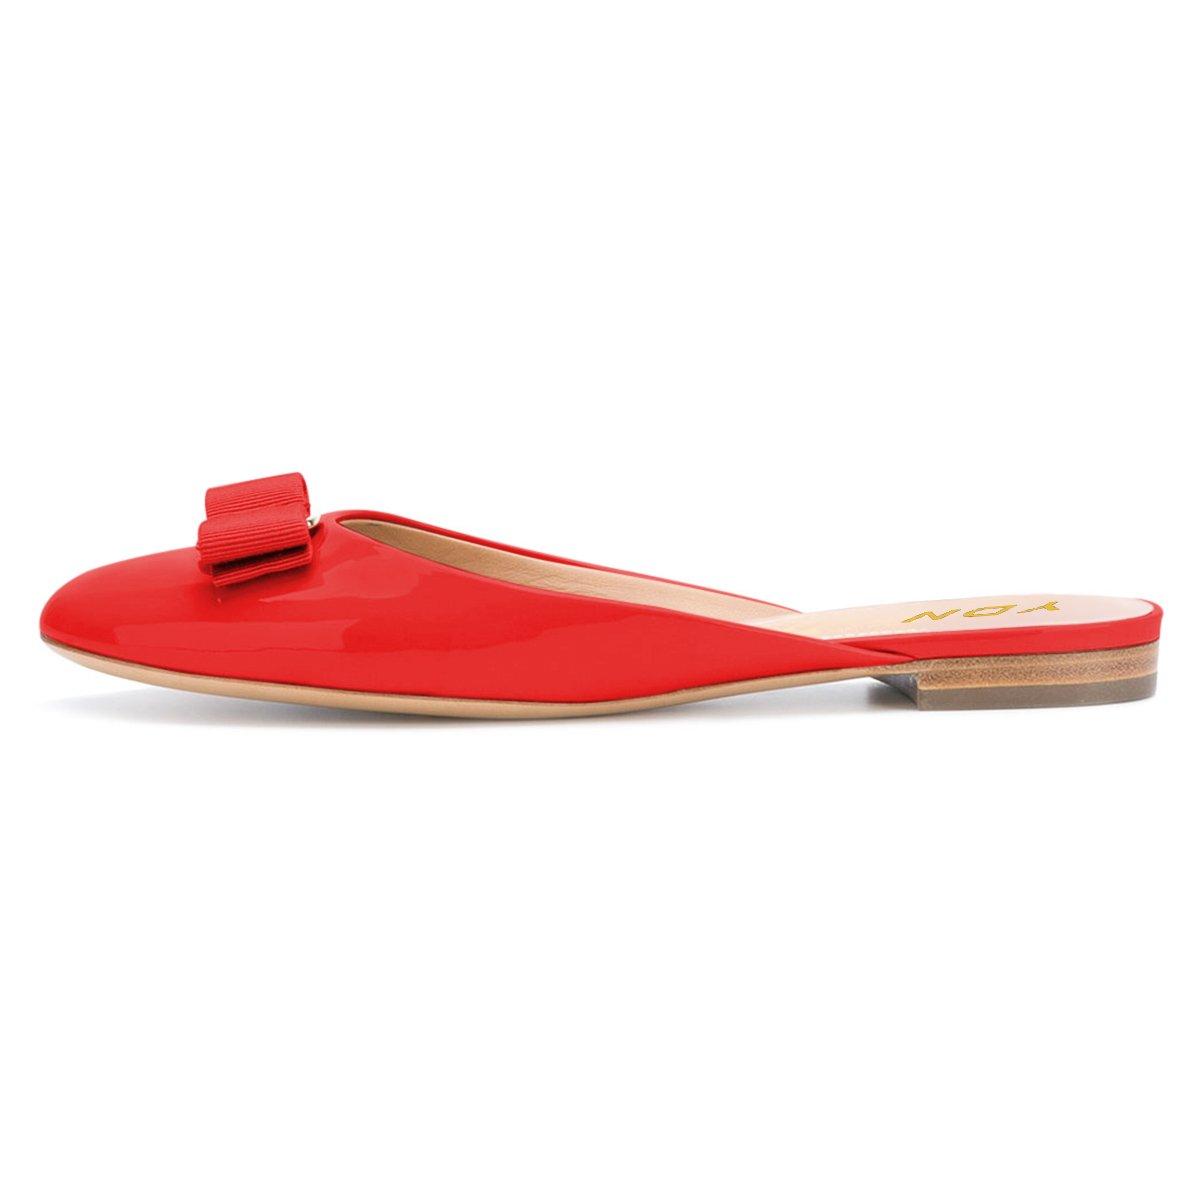 7eddece77e5 YDN Women Round Toe Low Heel Flats Slip on Bowknot Slippers Summer Slide  Clog Shoes